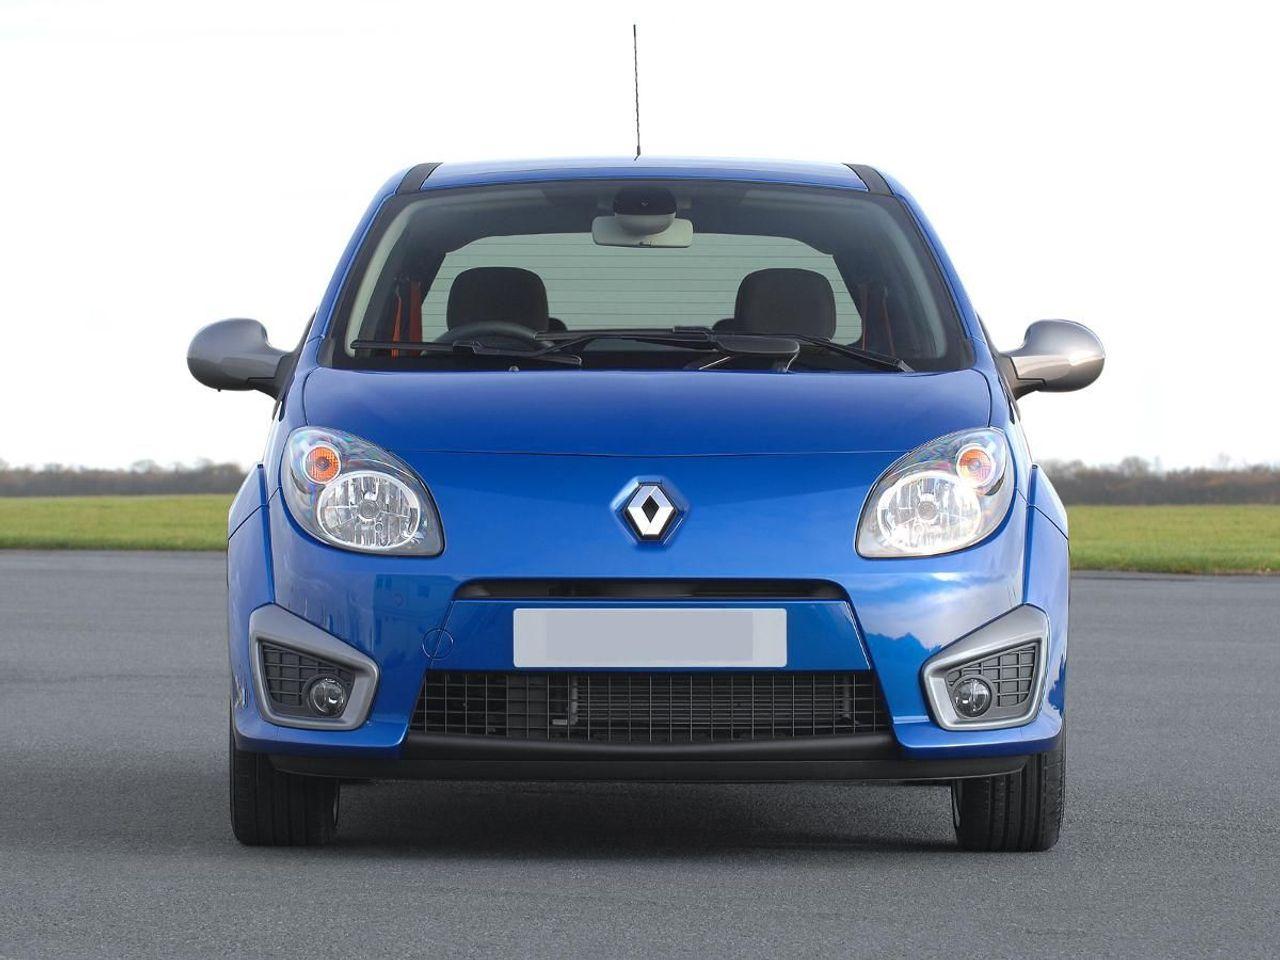 Renault Twingo Renaultsport hatchback